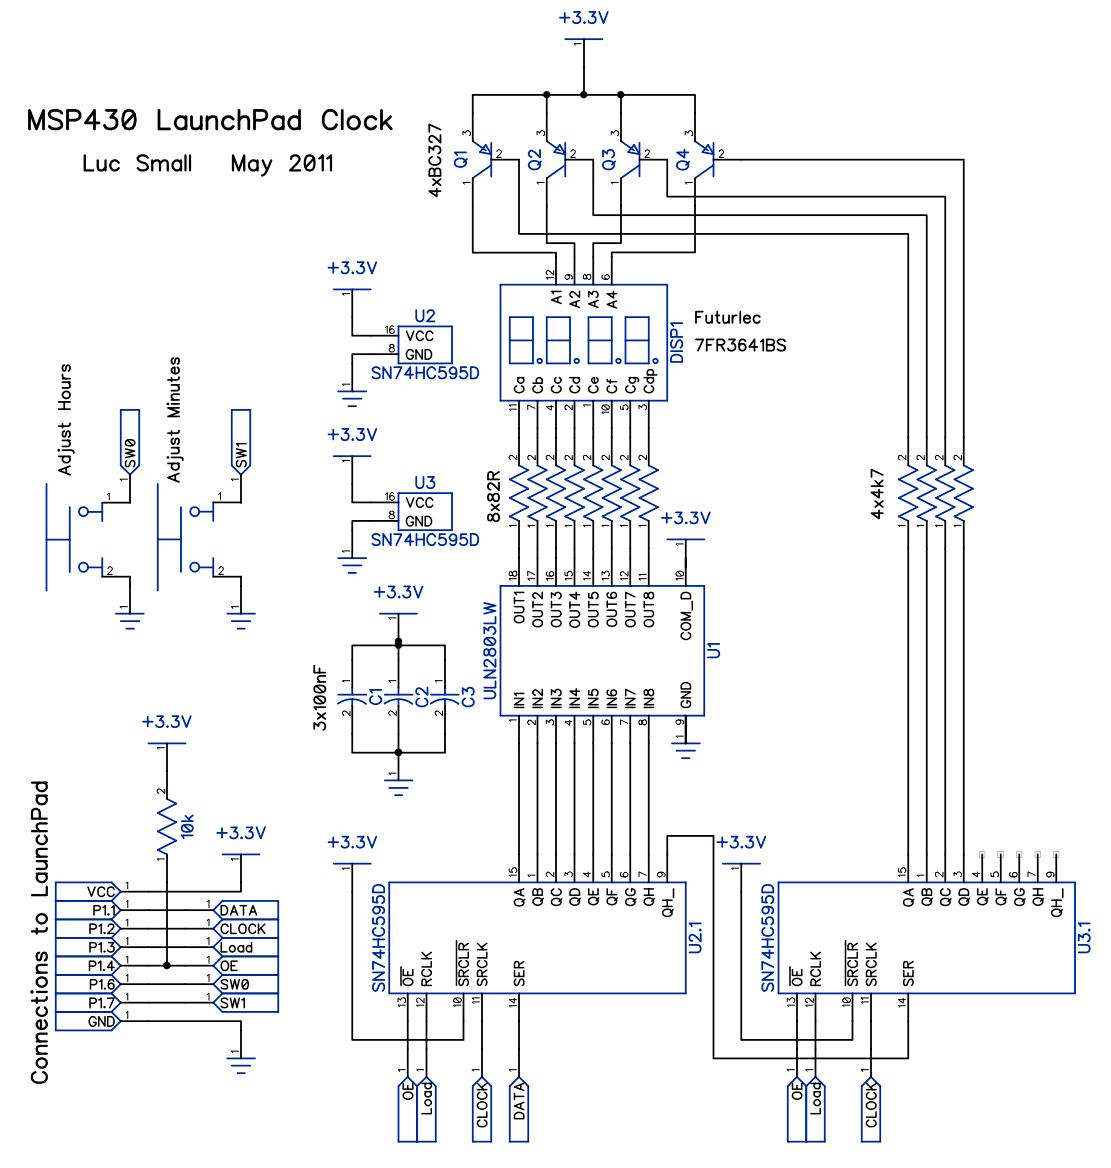 Msp430 Launchpad Clock